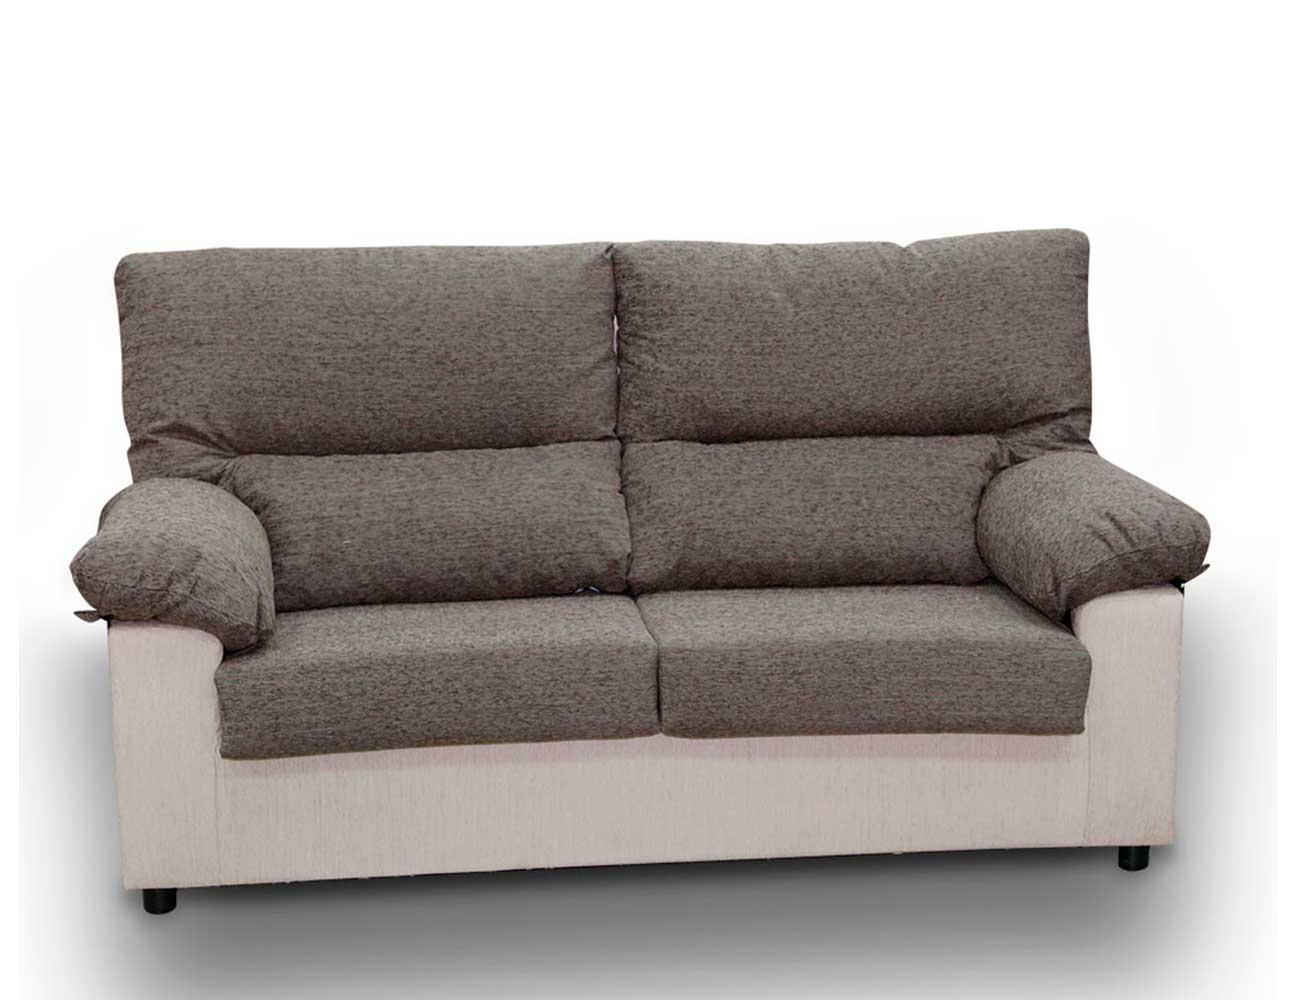 Sofa 3 plazas barato18